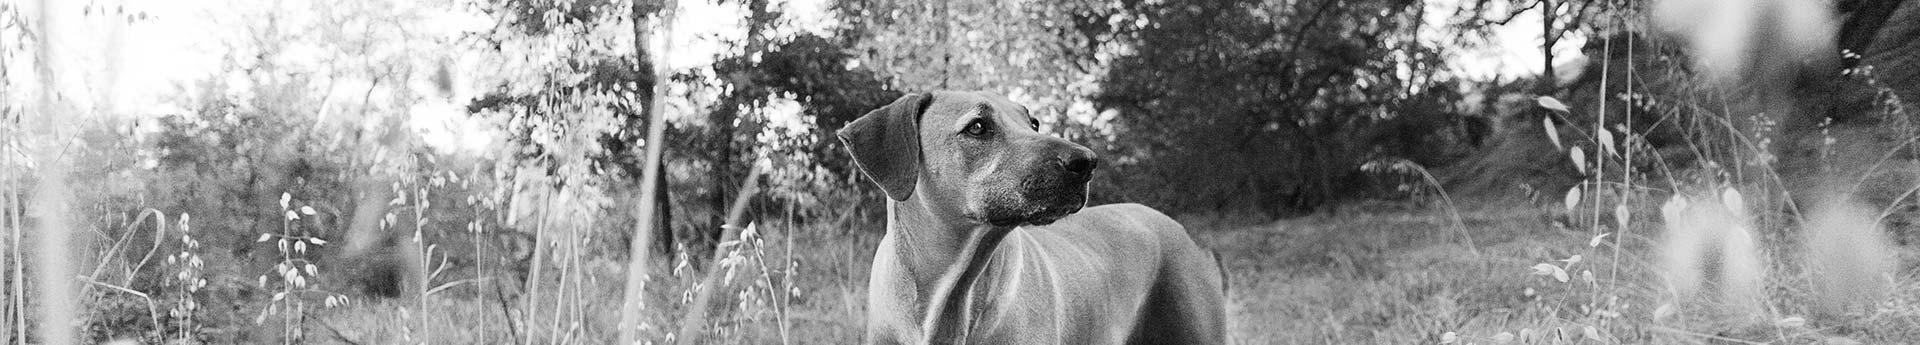 ORIJEN Senior Dog Food - Dog looking curiously in the woods - Koya from Reedley, California